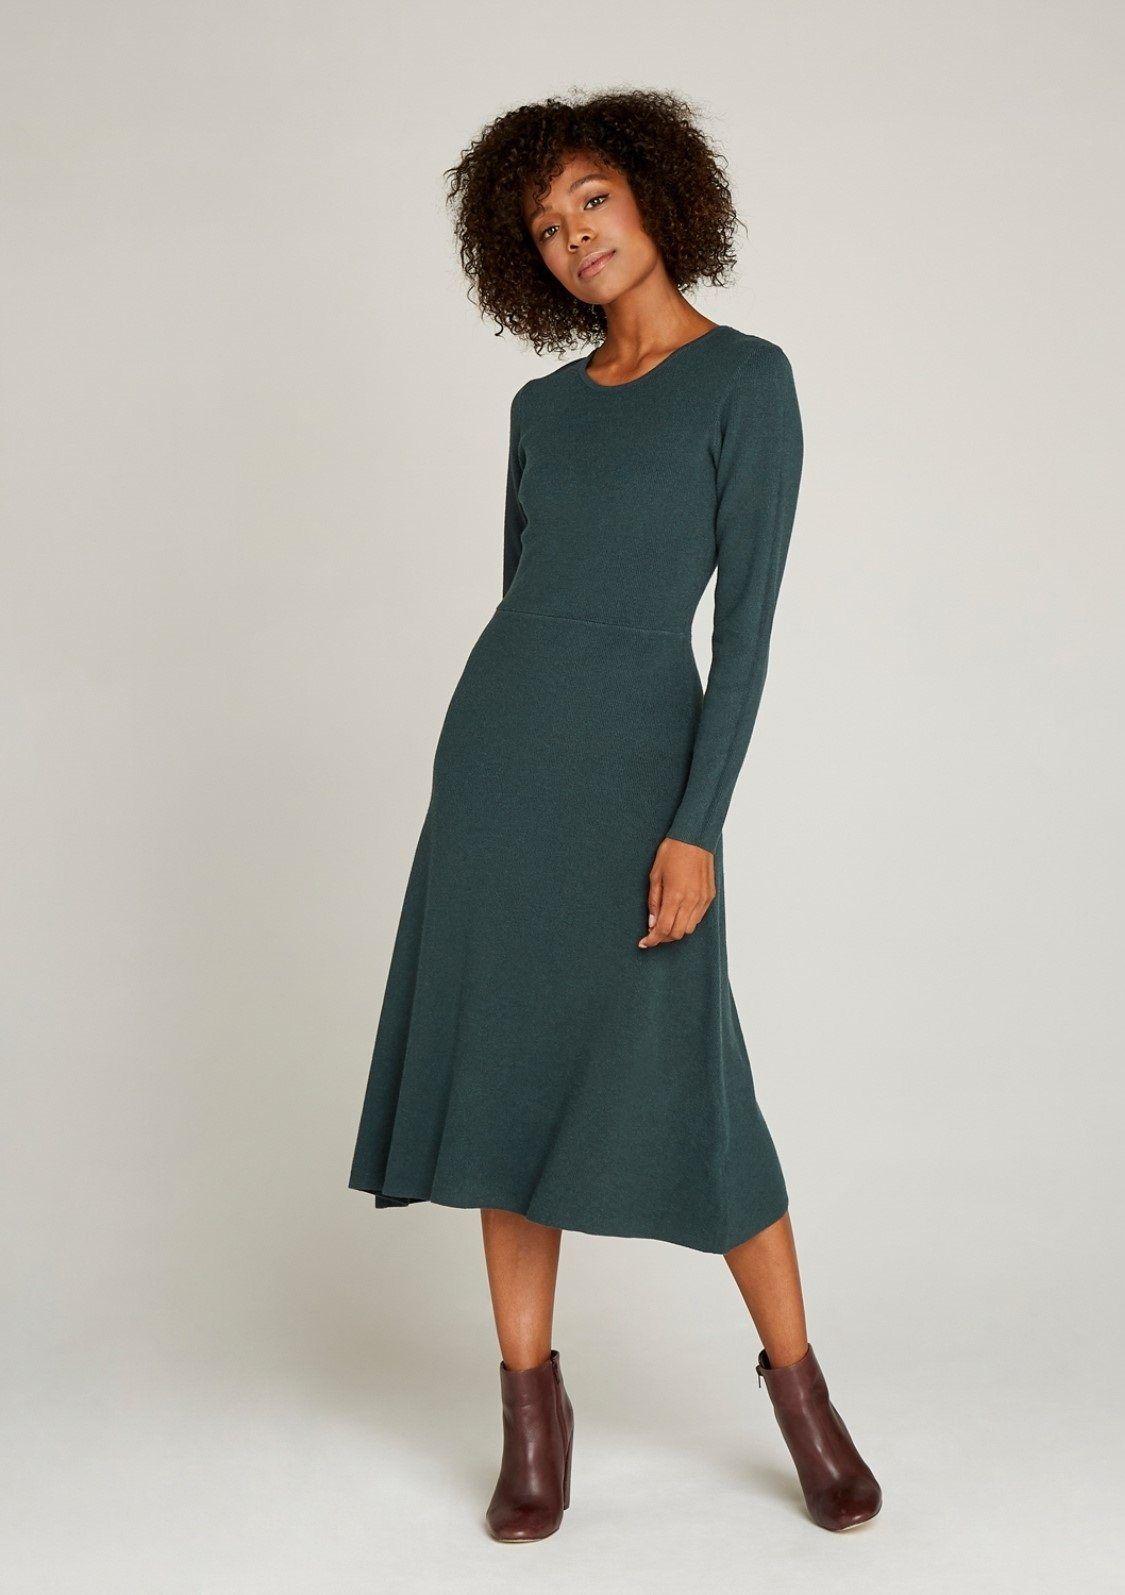 OTTO #Bekleidung #Kleider #Damen #Apricot #Strickkleid #Plain #10s